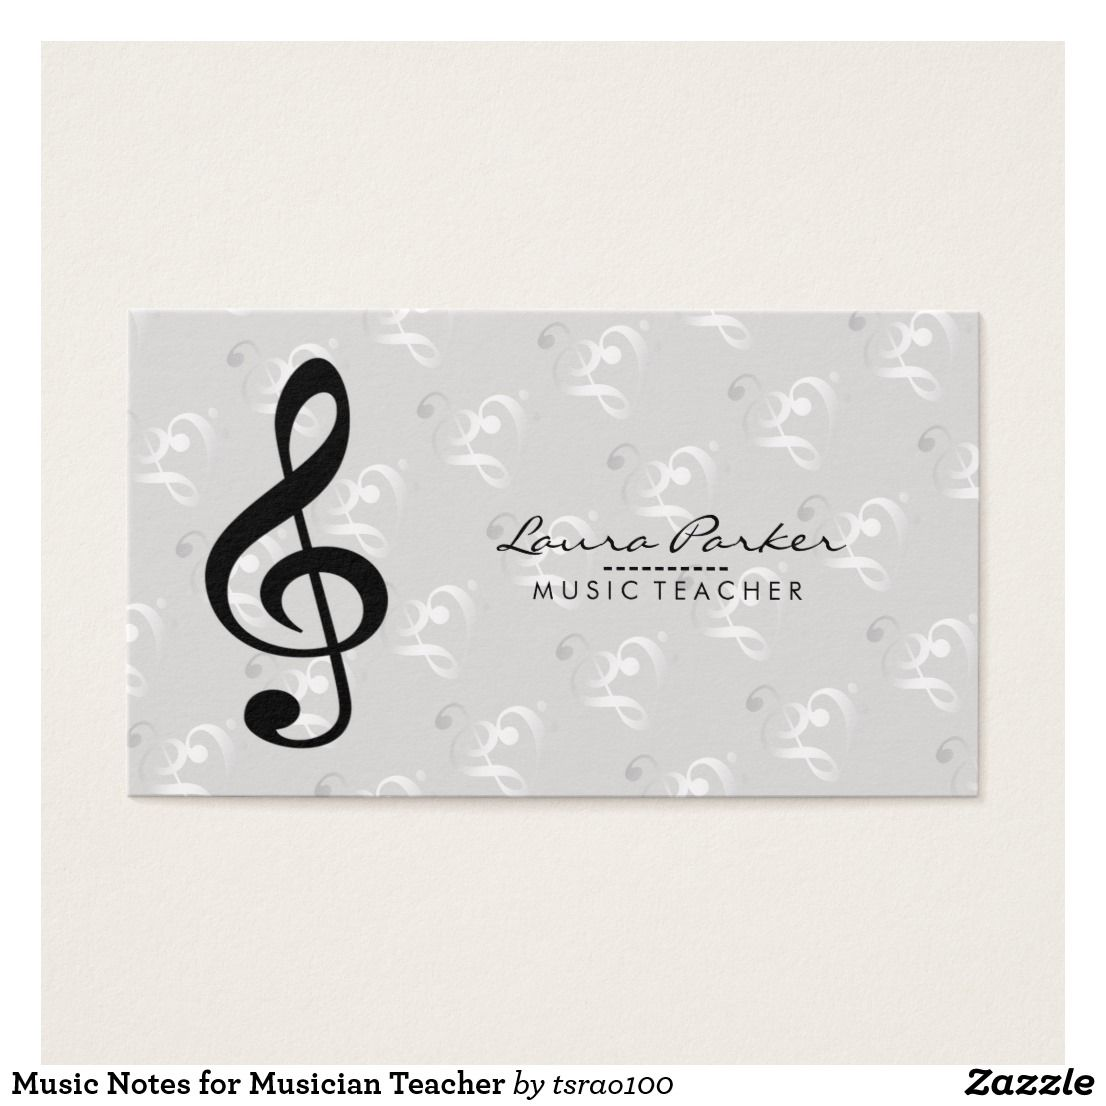 Music Notes for Musician Teacher | Music Business Card for Music ...